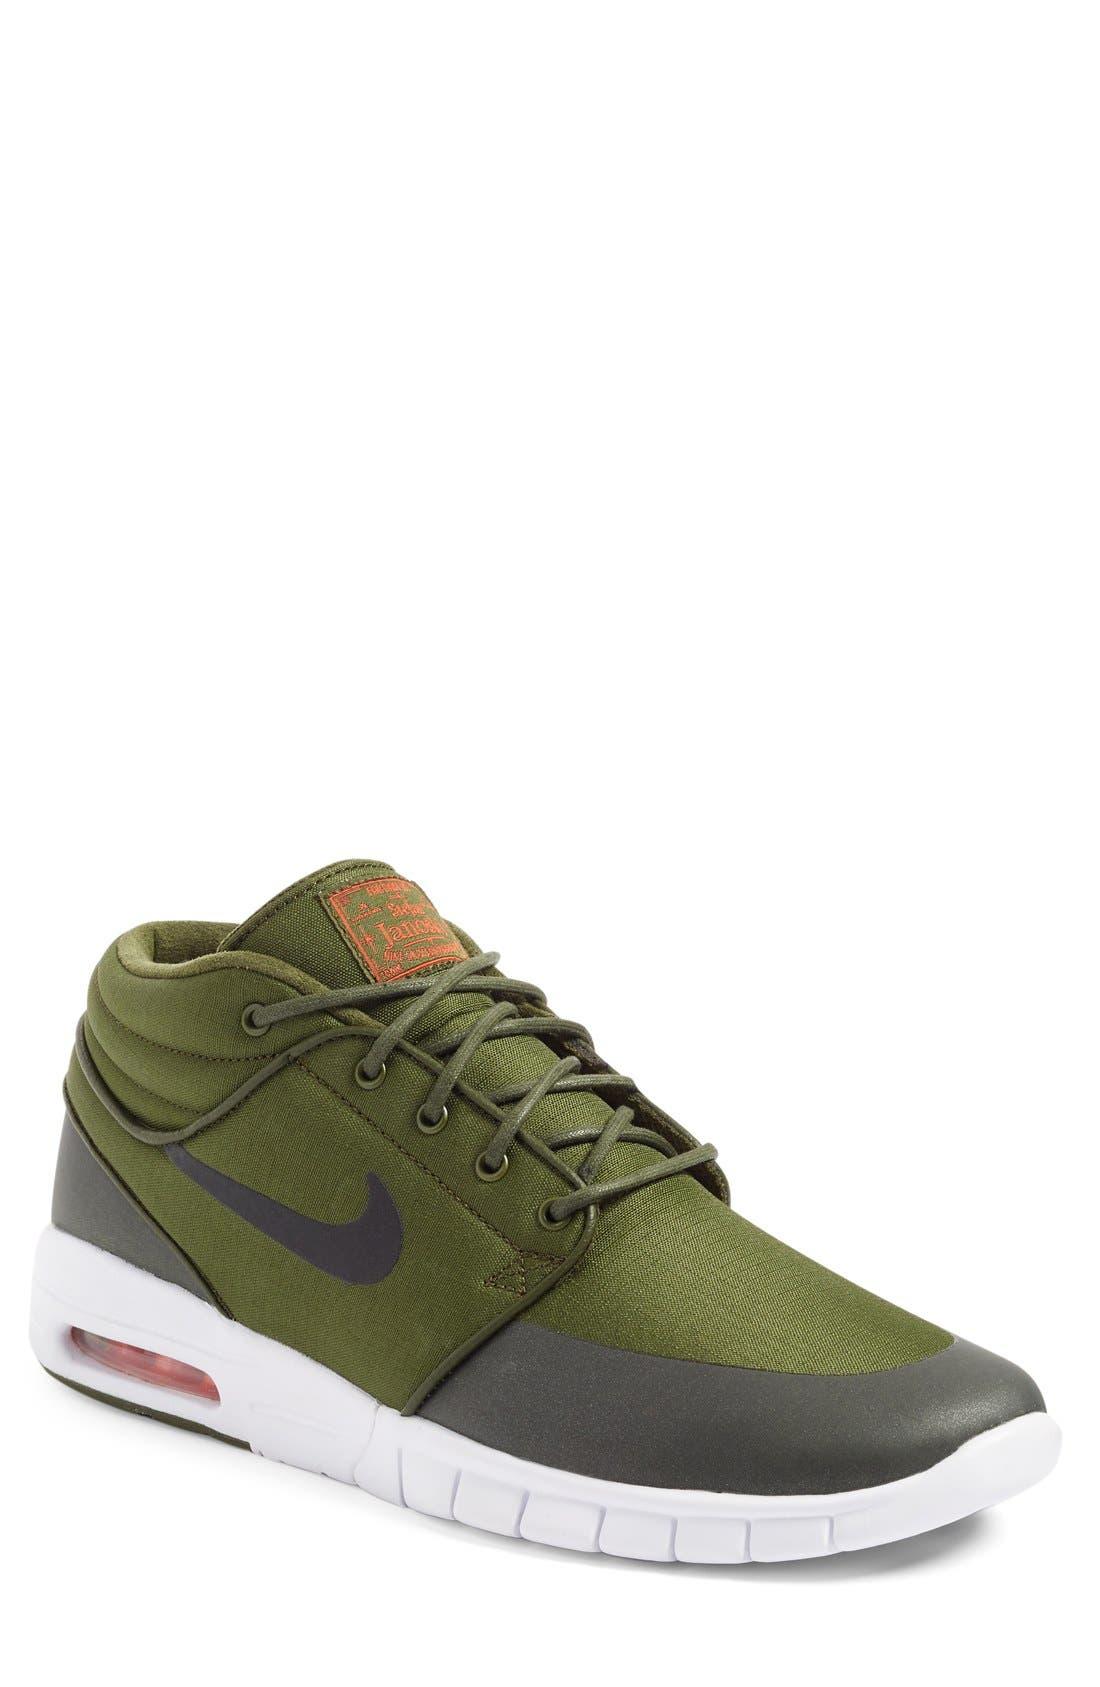 Main Image - Nike SB Stefan Janoski Max Mid Skate Shoe (Men)